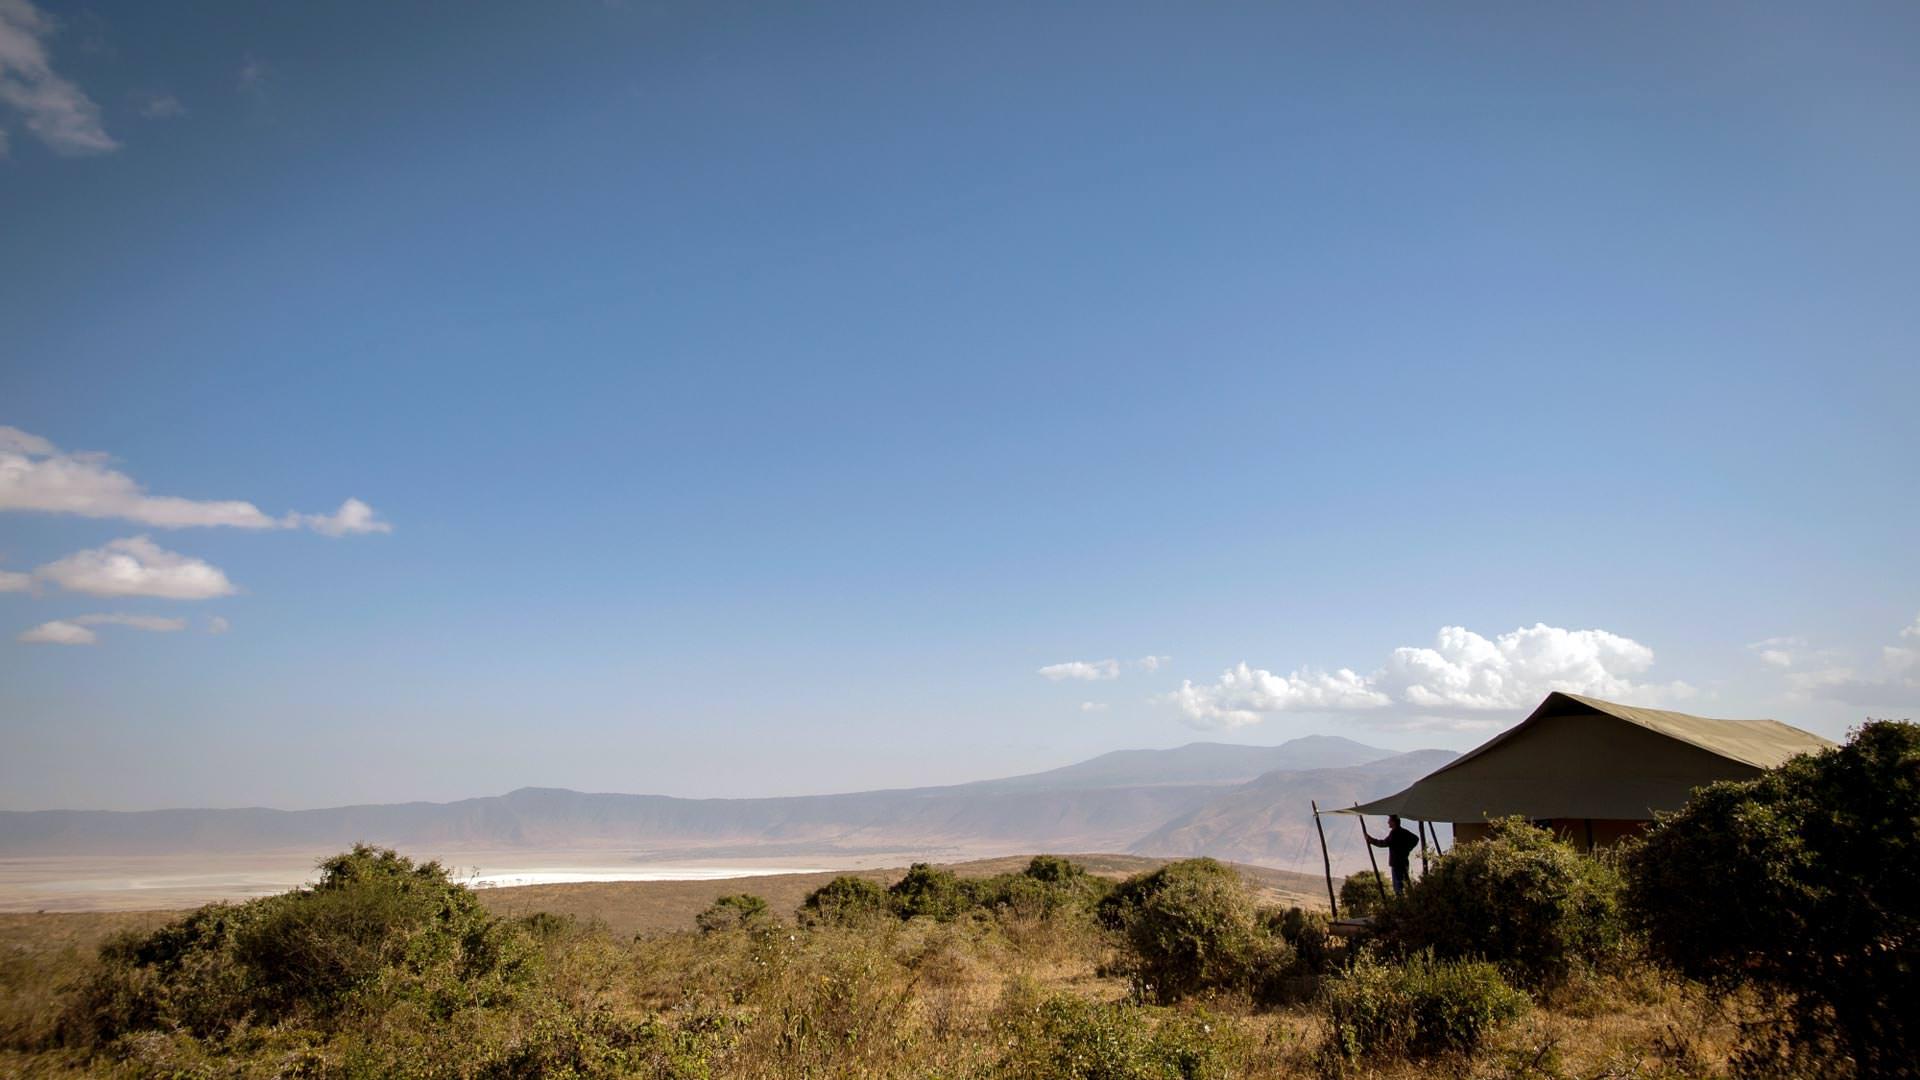 View into Ngorongoro Crater